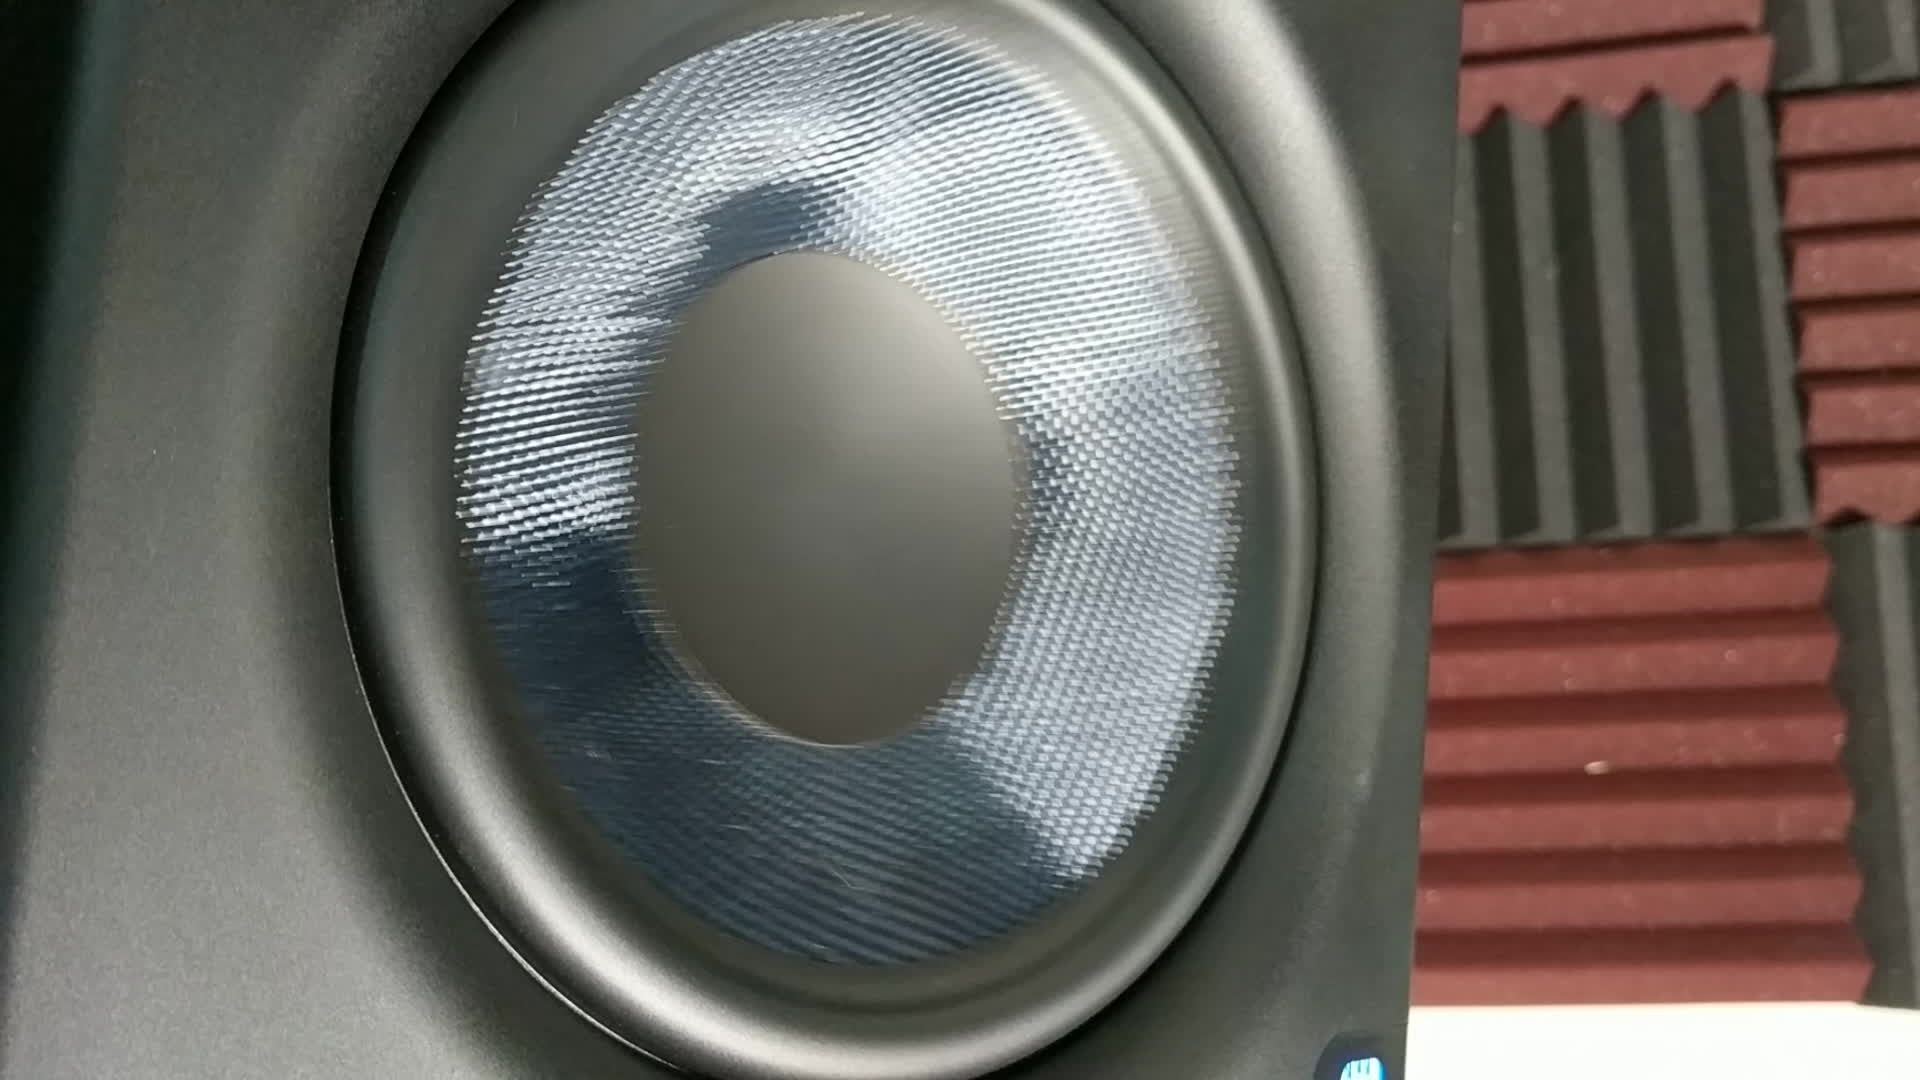 audiophile, New Schiit Gungnir & Mjolnir 2 driving some very powerful sound GIFs